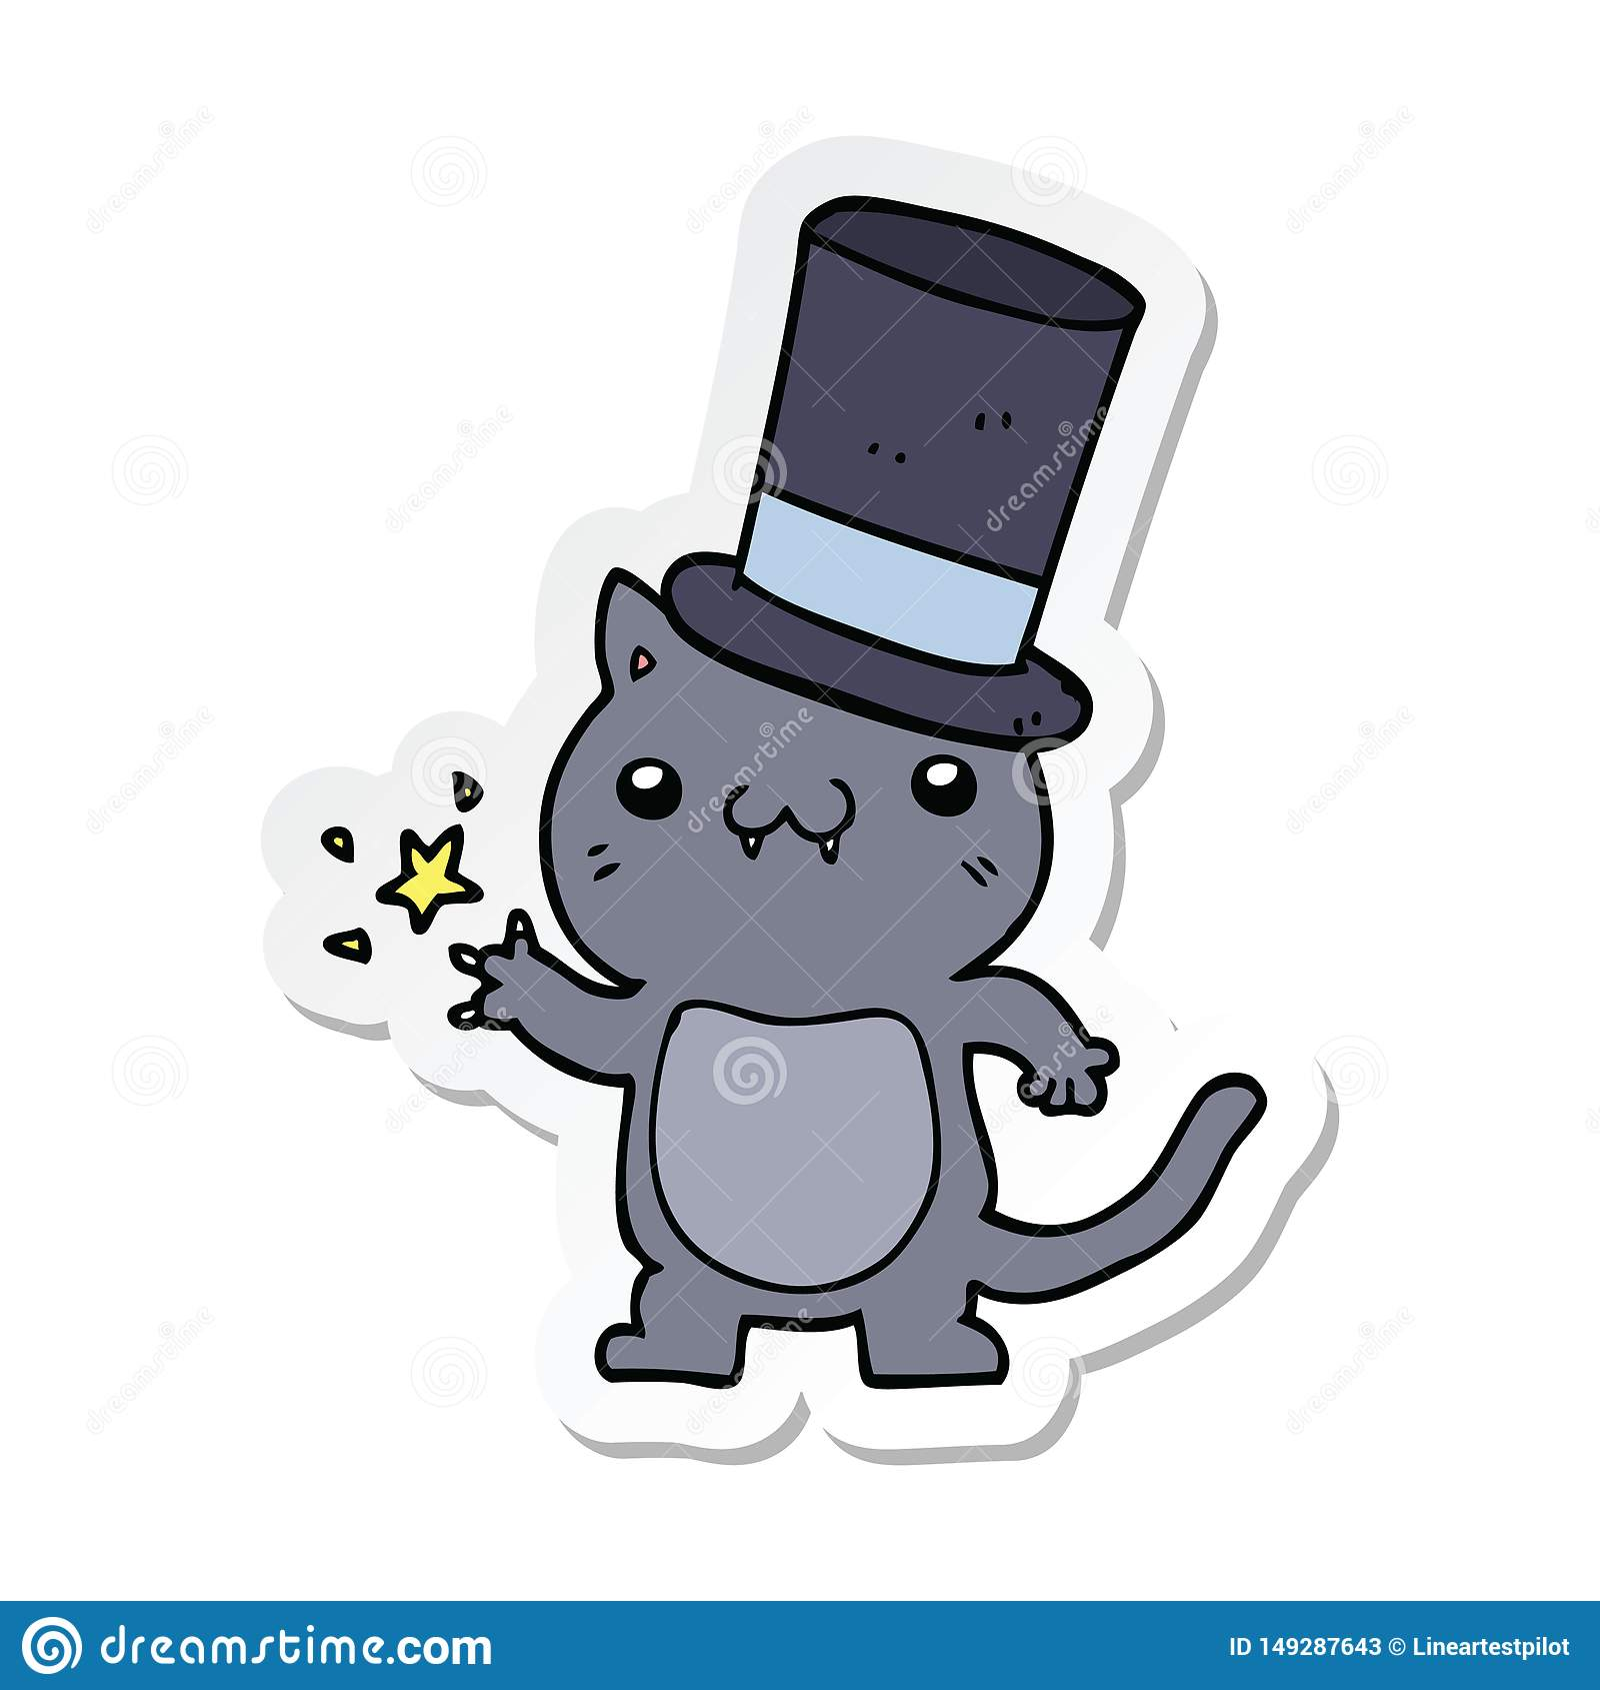 Cartoon Cat Top Hat Stock Illustrations 328 Cartoon Cat Top Hat Stock Illustrations Vectors Clipart Dreamstime